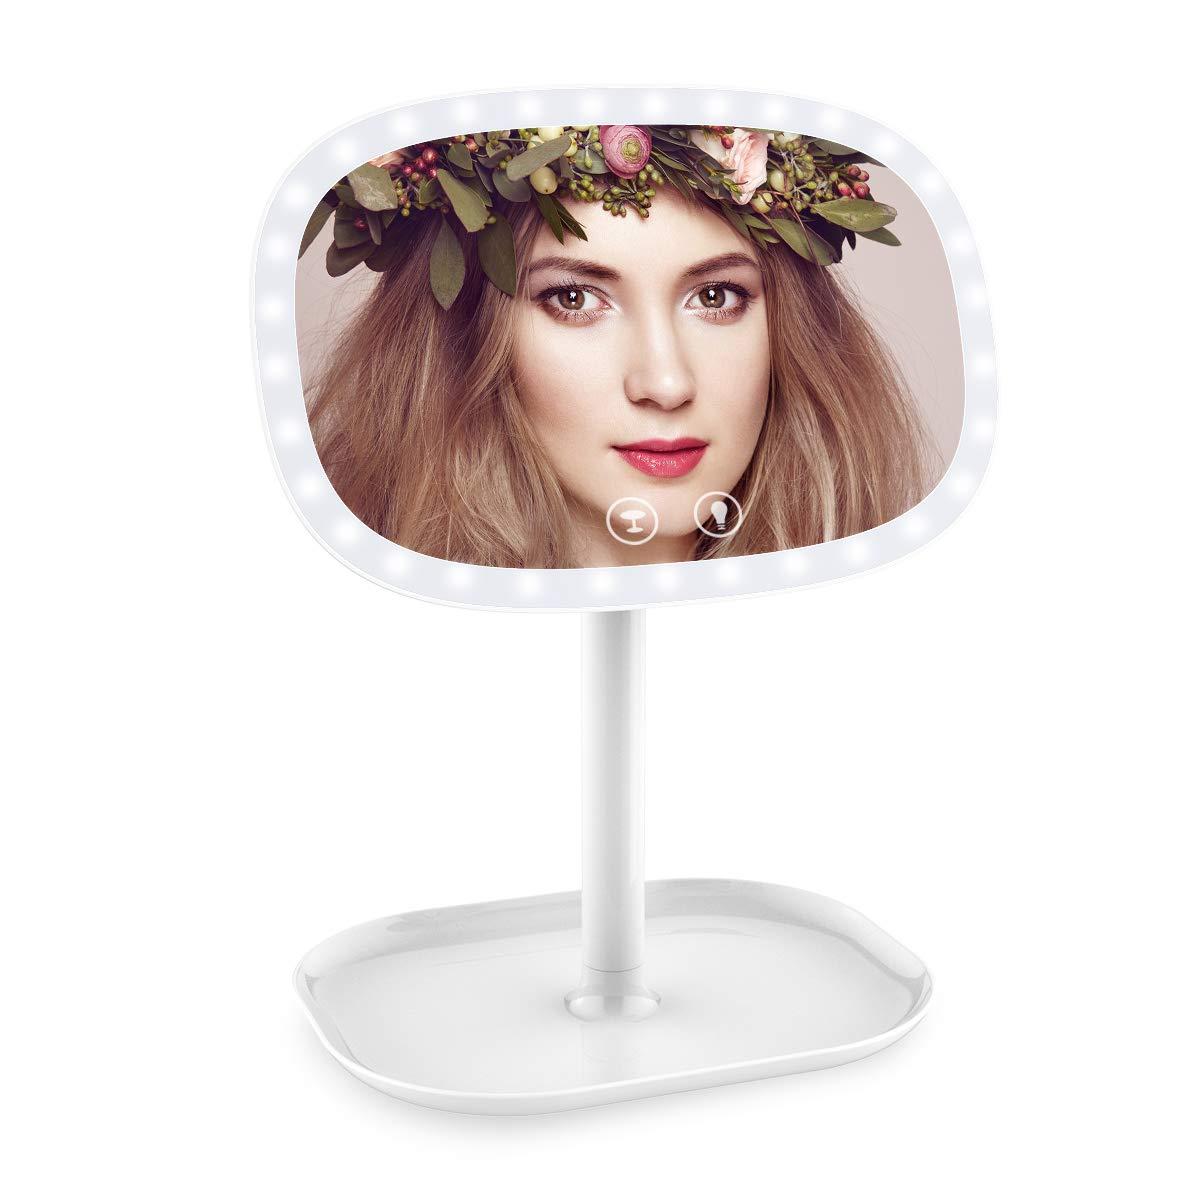 ERAY Espejo de Maquillaje 1X / 10X Aumento, 37 LED Luces Ajustables, USB Recargable o Baterías, Control de Luz de Pantalla Táctil, 360° Rotación, Claridad de Alta Definició y Portátil, Buen Regalo para Novias o Mujeres, Color Rosa